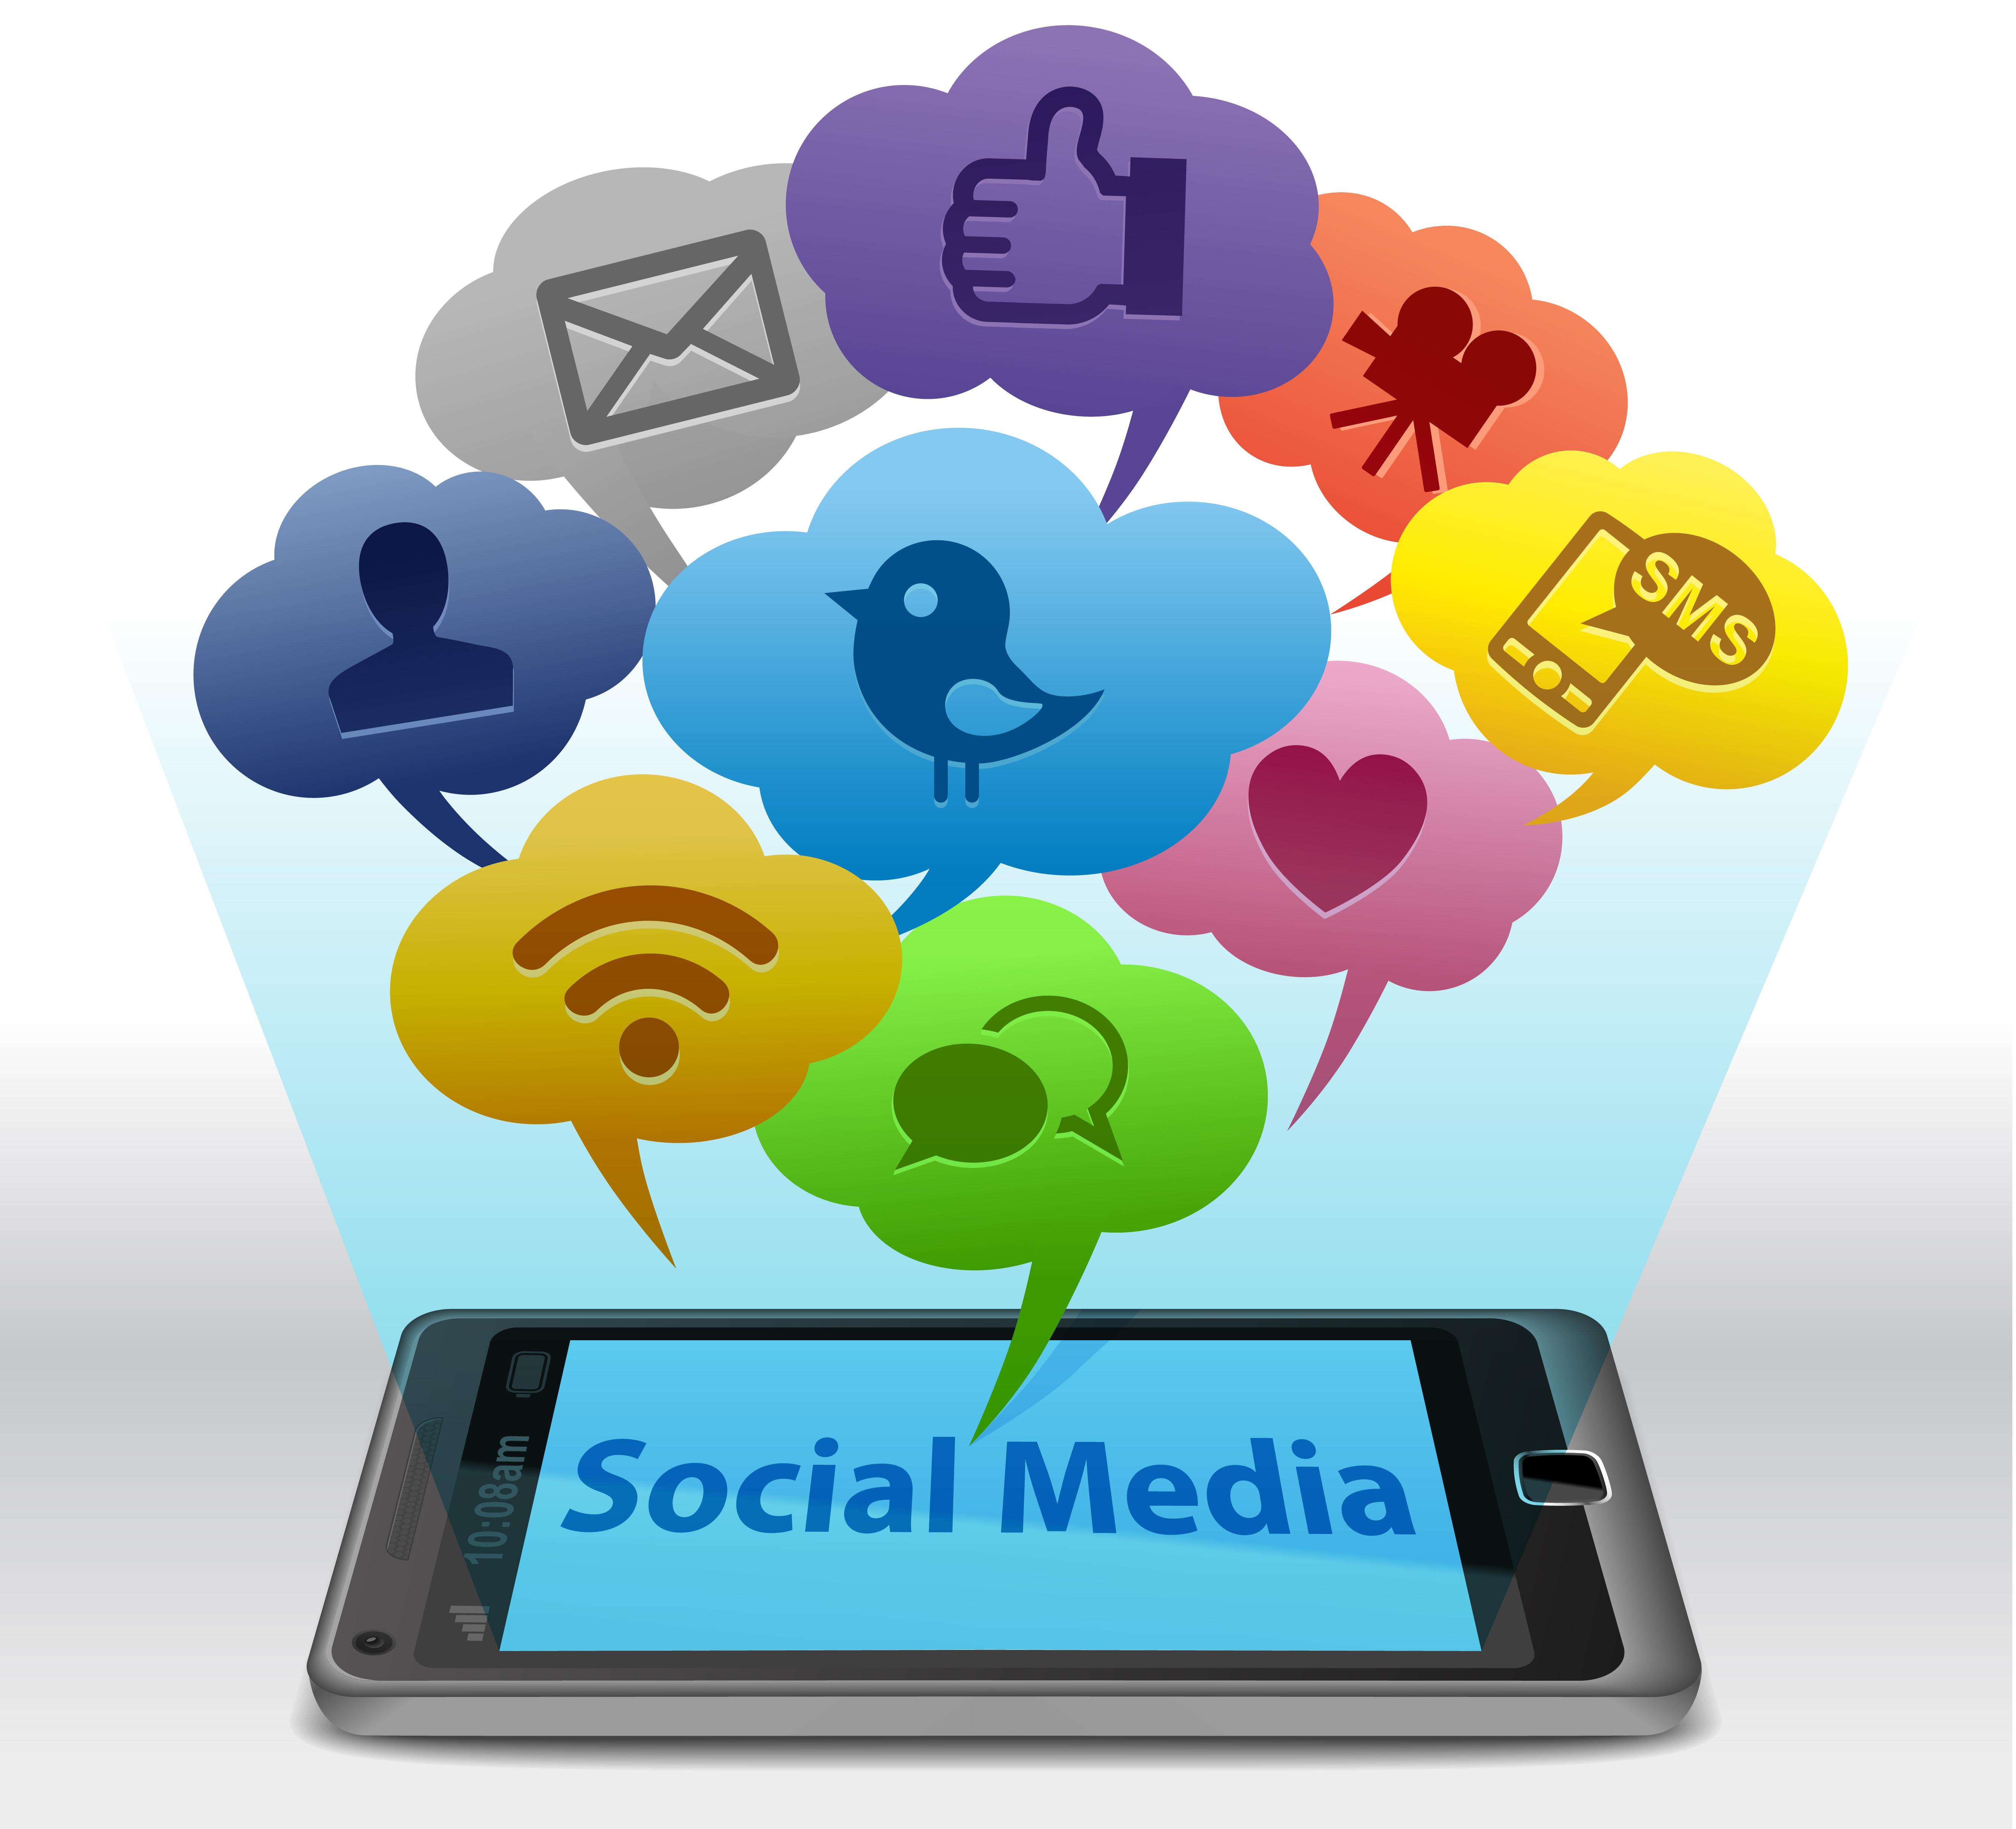 ISMC - Social Media